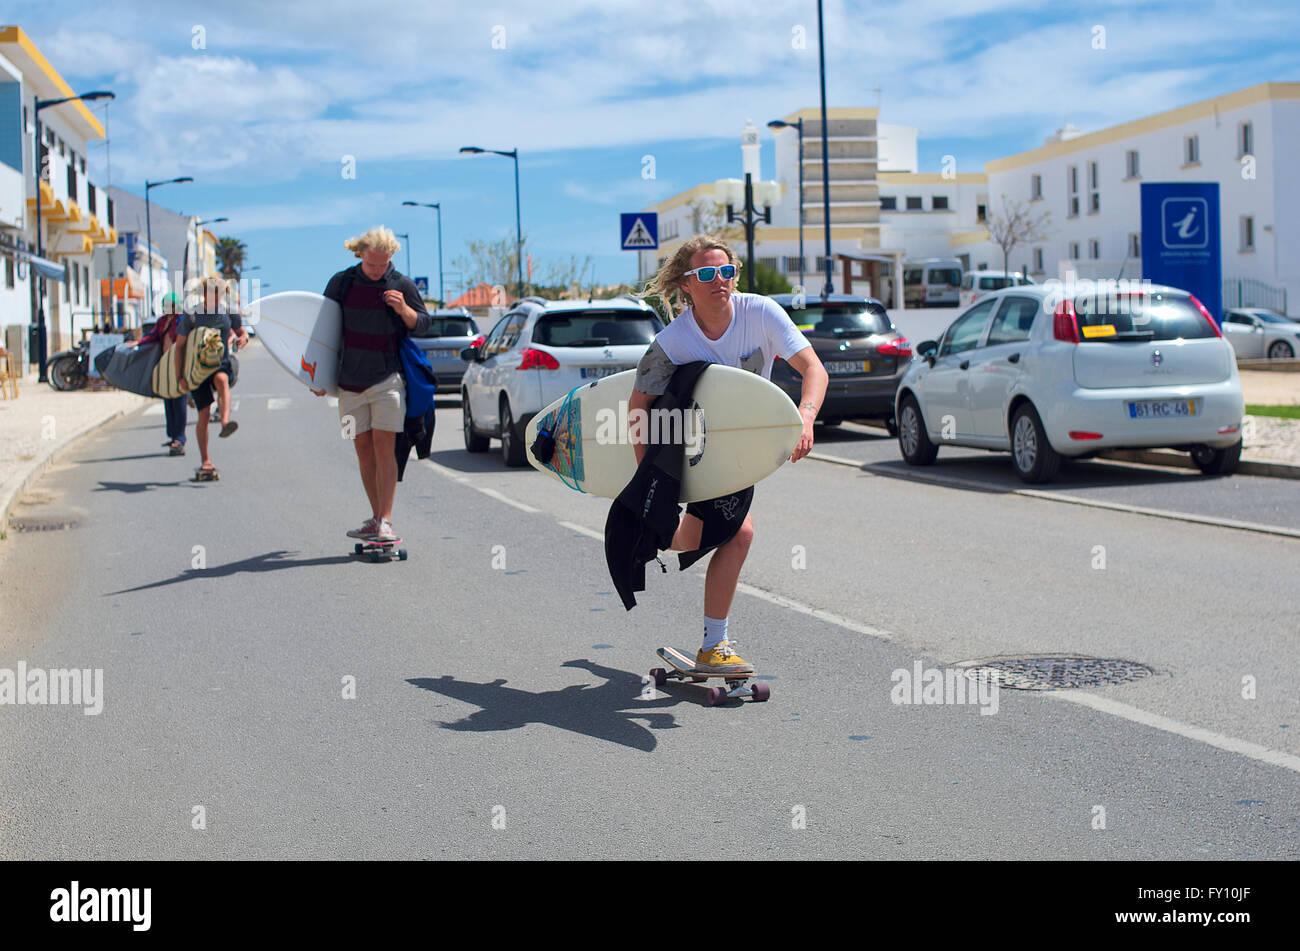 Blonde surfers skateboarding down the road, Sagres Portugal - Stock Image